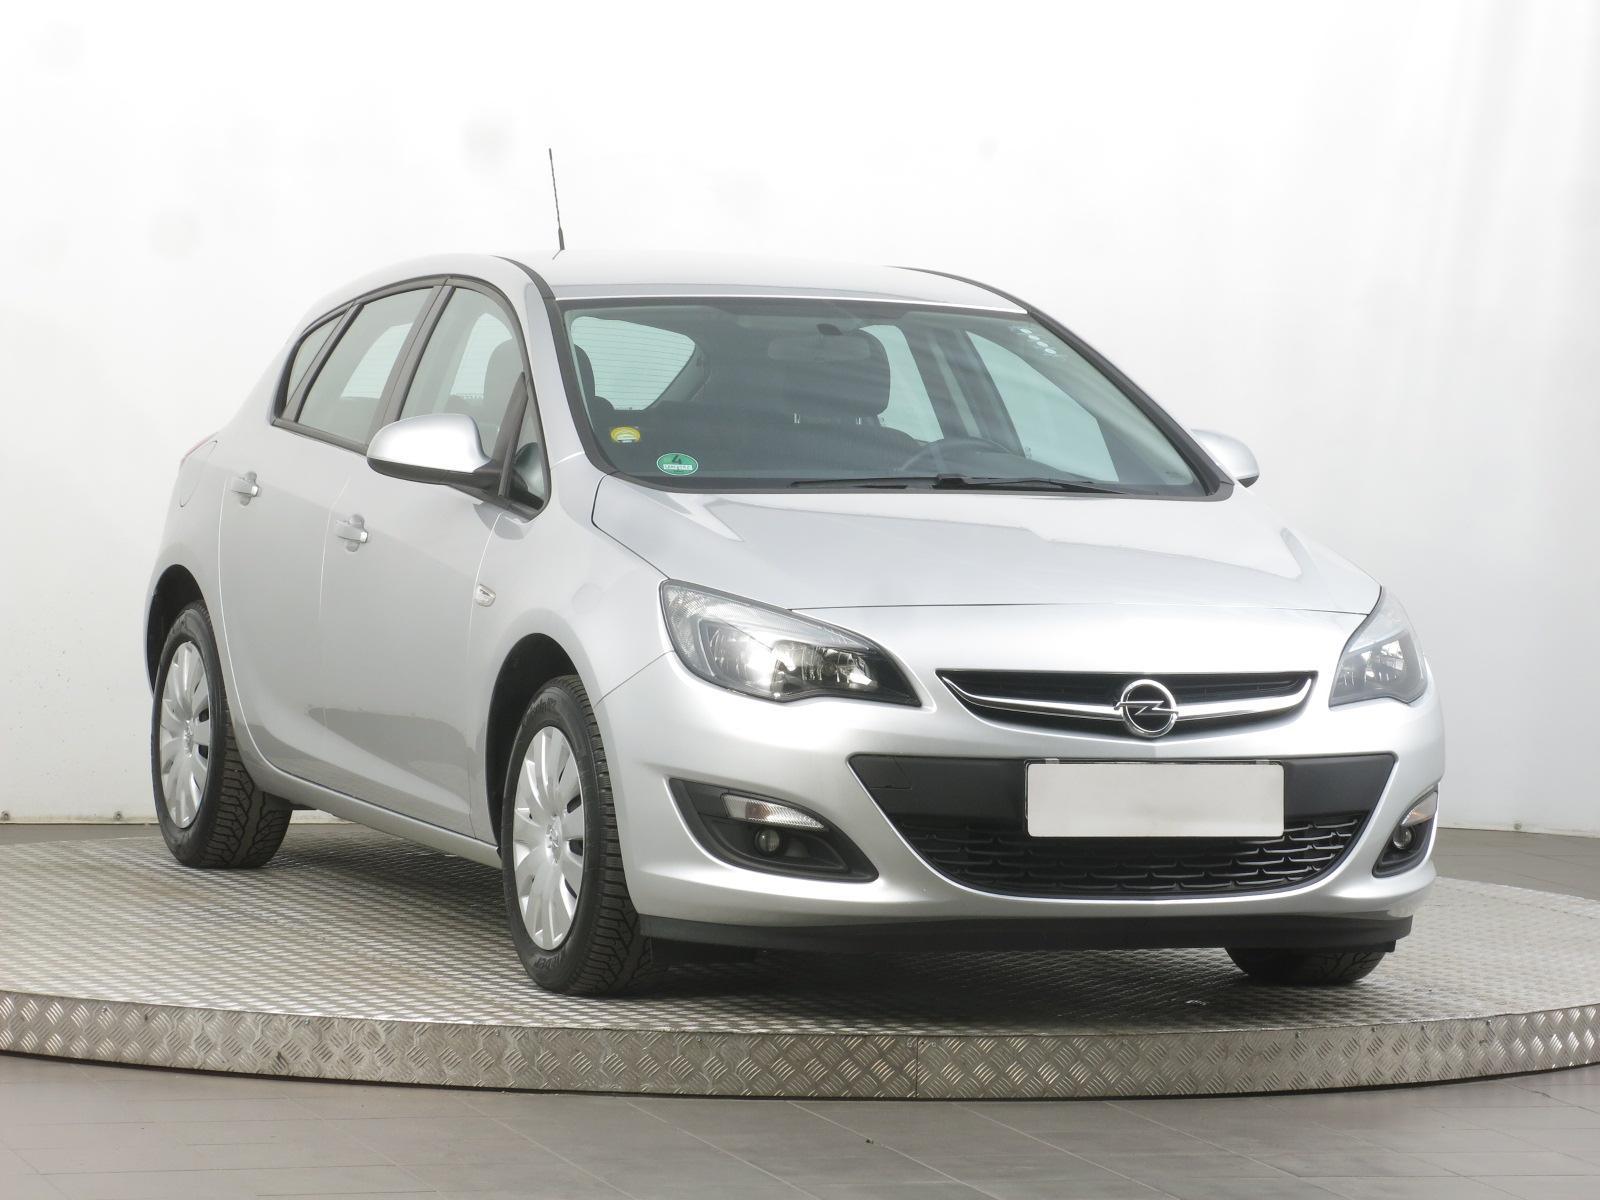 Opel Astra 1.6 CDTI 100kW hatchback nafta